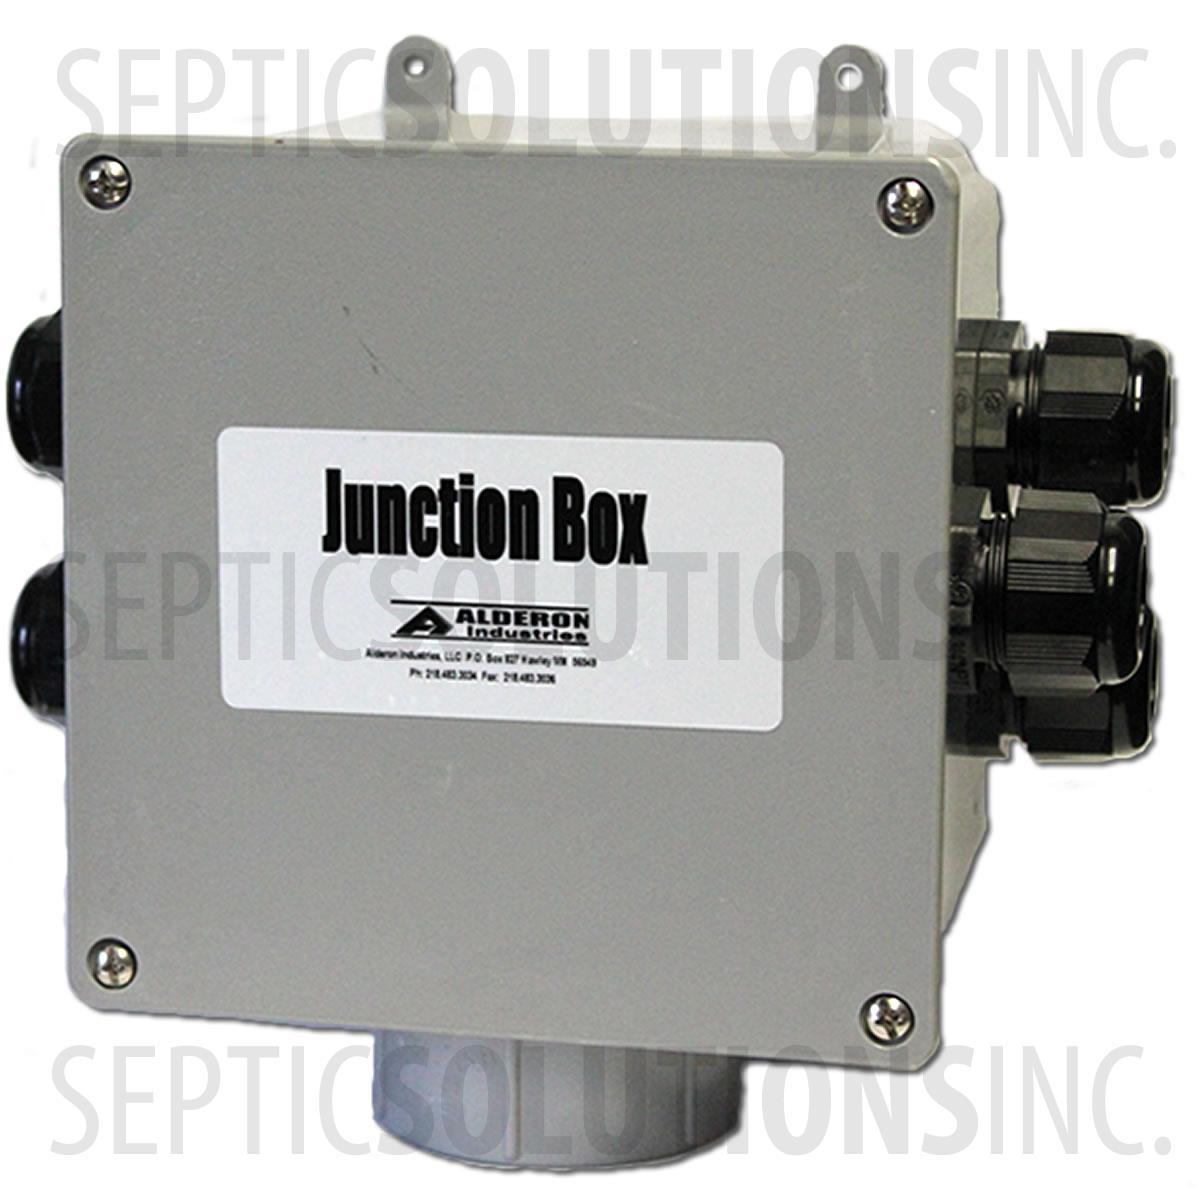 Alderon Medium Junction Box